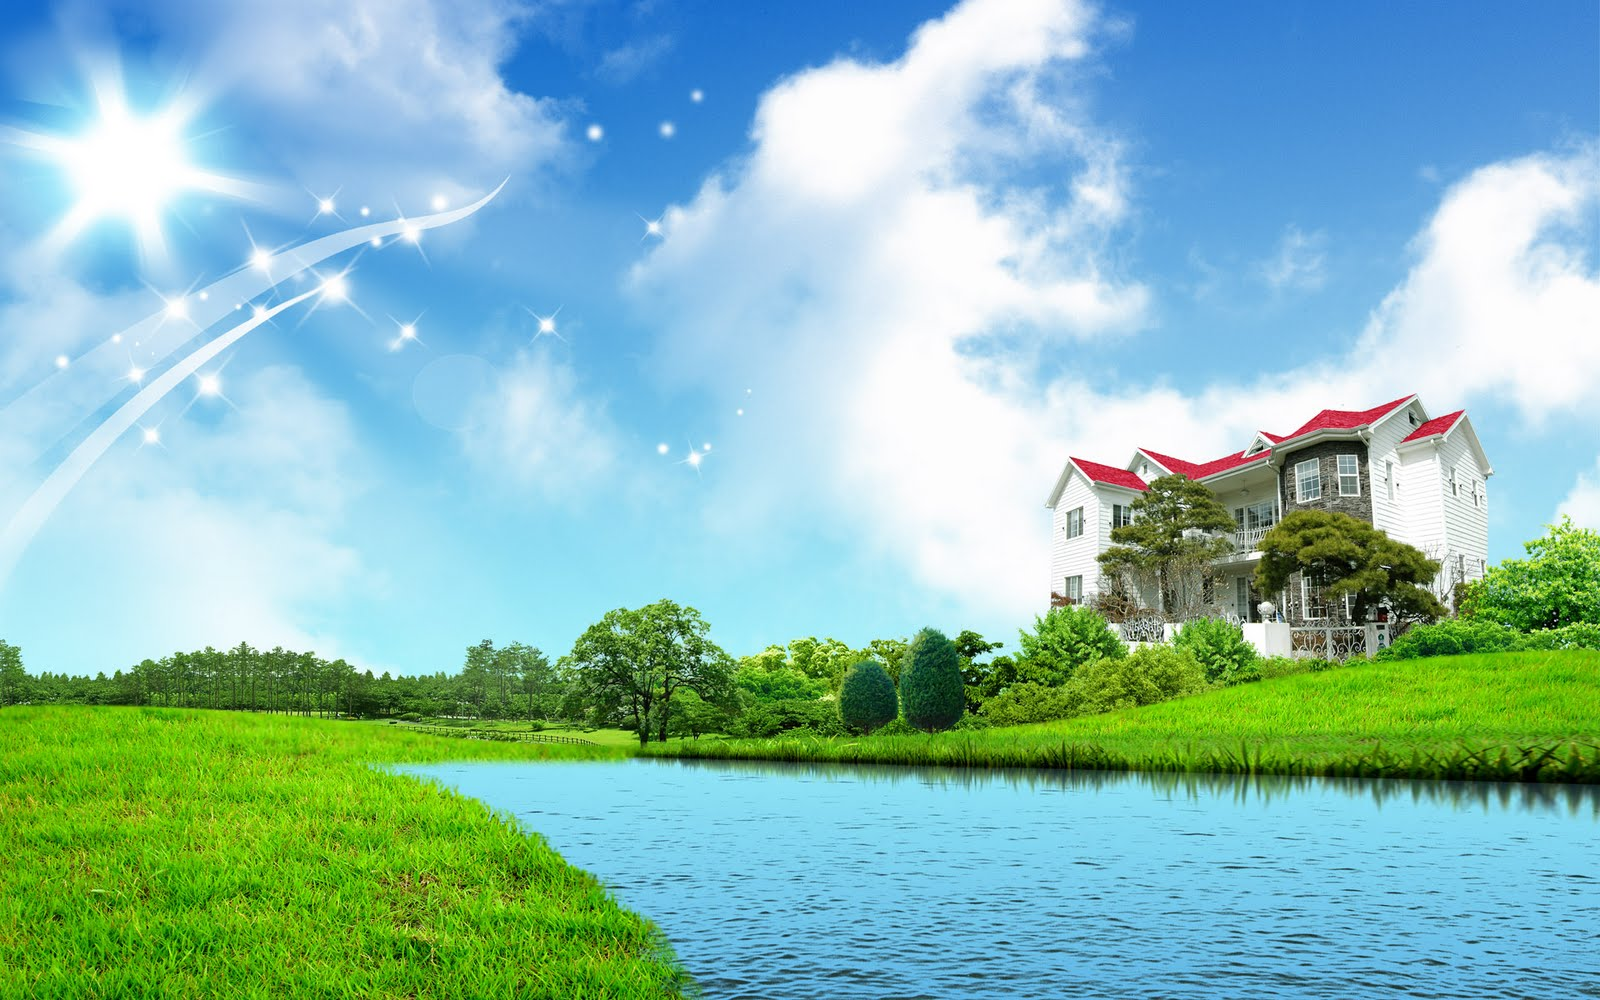 http://2.bp.blogspot.com/-Sy4rdo5Pb8k/ThUzauag6PI/AAAAAAAAAZE/uZl2Lltgqqg/s1600/sweet_home-wide.jpg